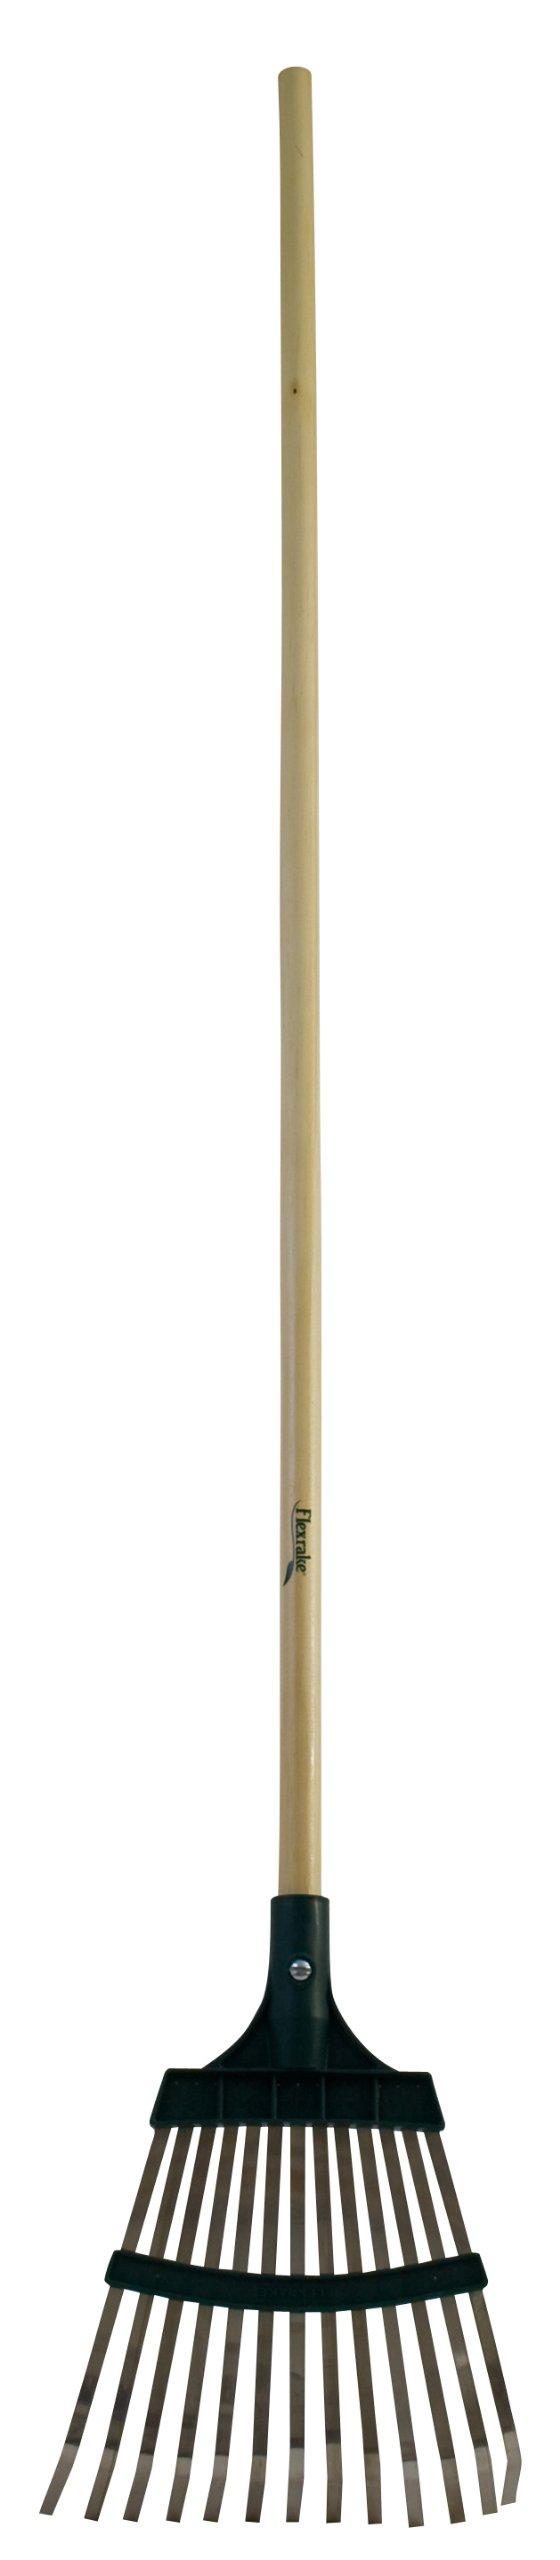 Flexrake 10W Shrub Rake 10-Inch Metal/Poly with 48-Inch Wood Handle